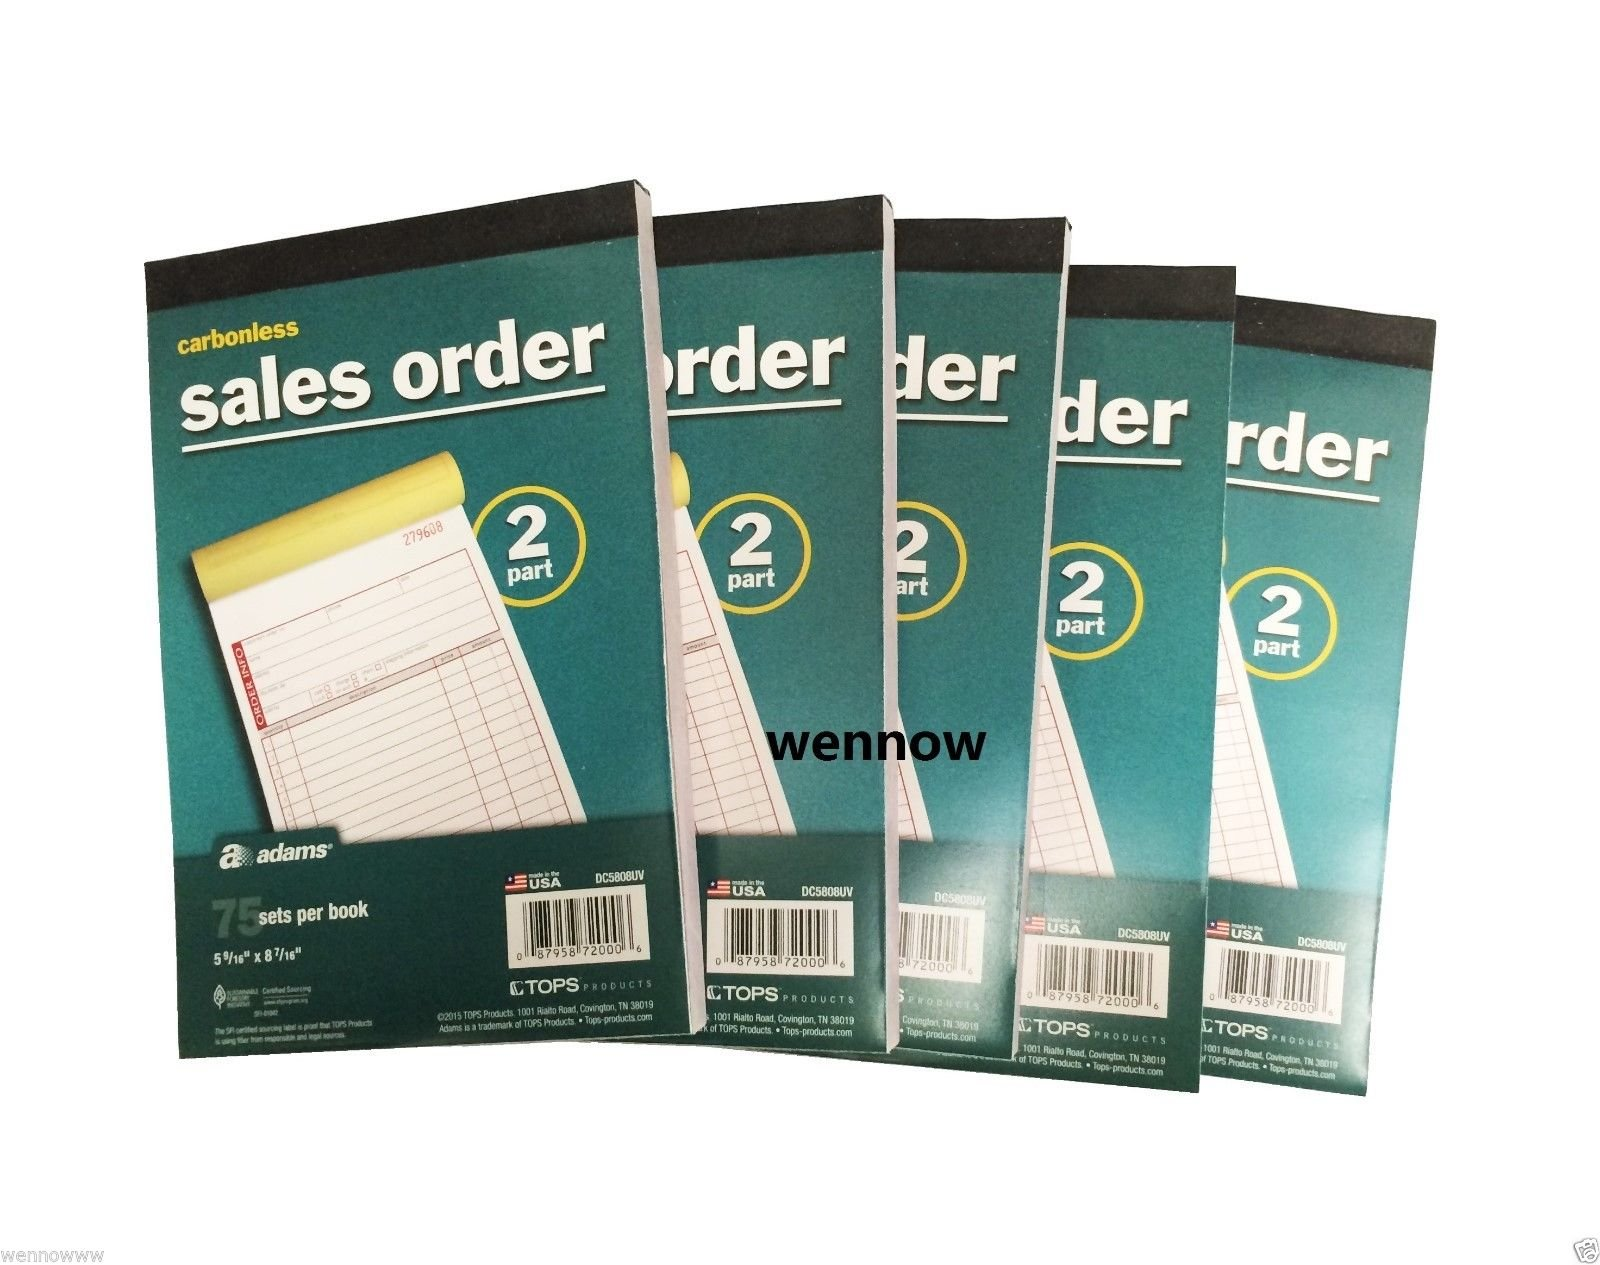 Wennow 5pk Sales Order Book Carbonless 2 part Adams DC5808UV BRAND NEW invoice